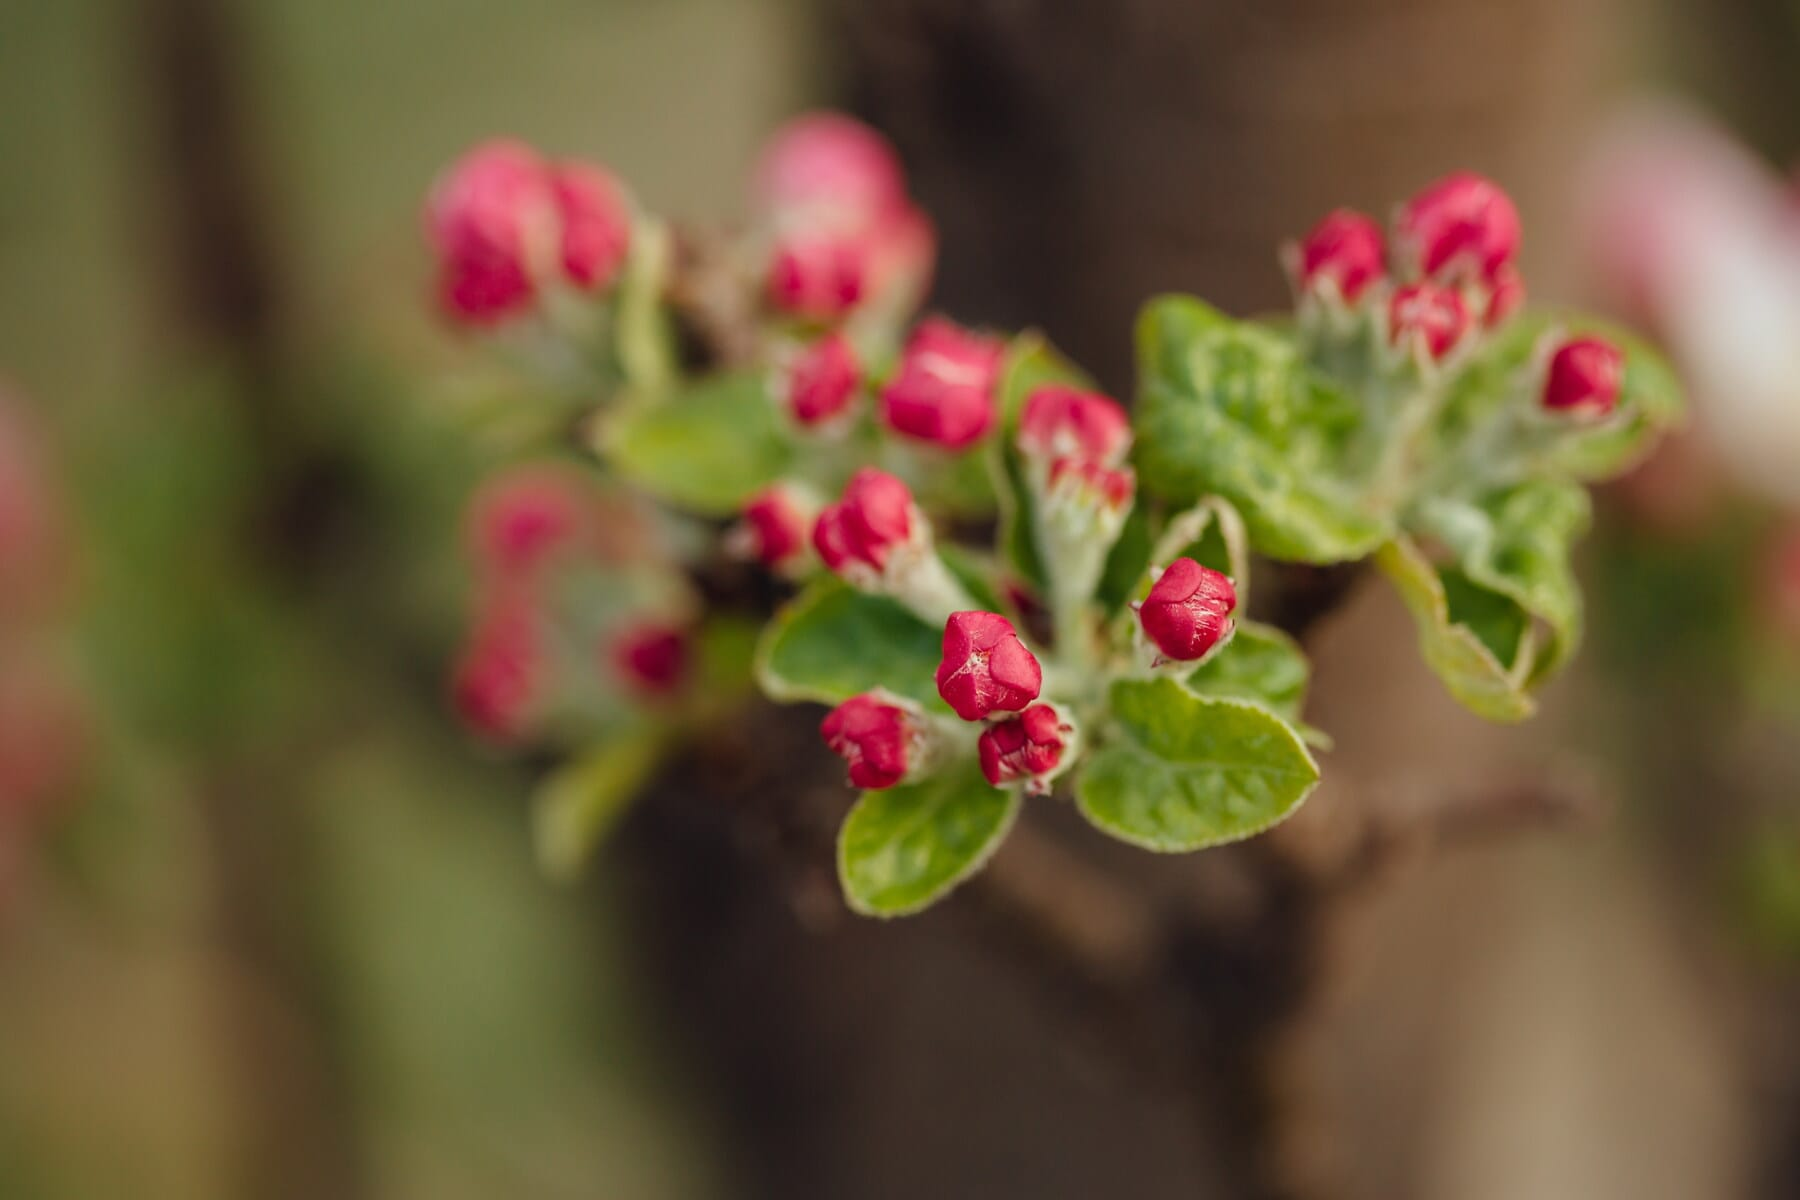 fruit tree, close-up, apple tree, spring time, flowering, petal, flower bud, nature, plant, flower